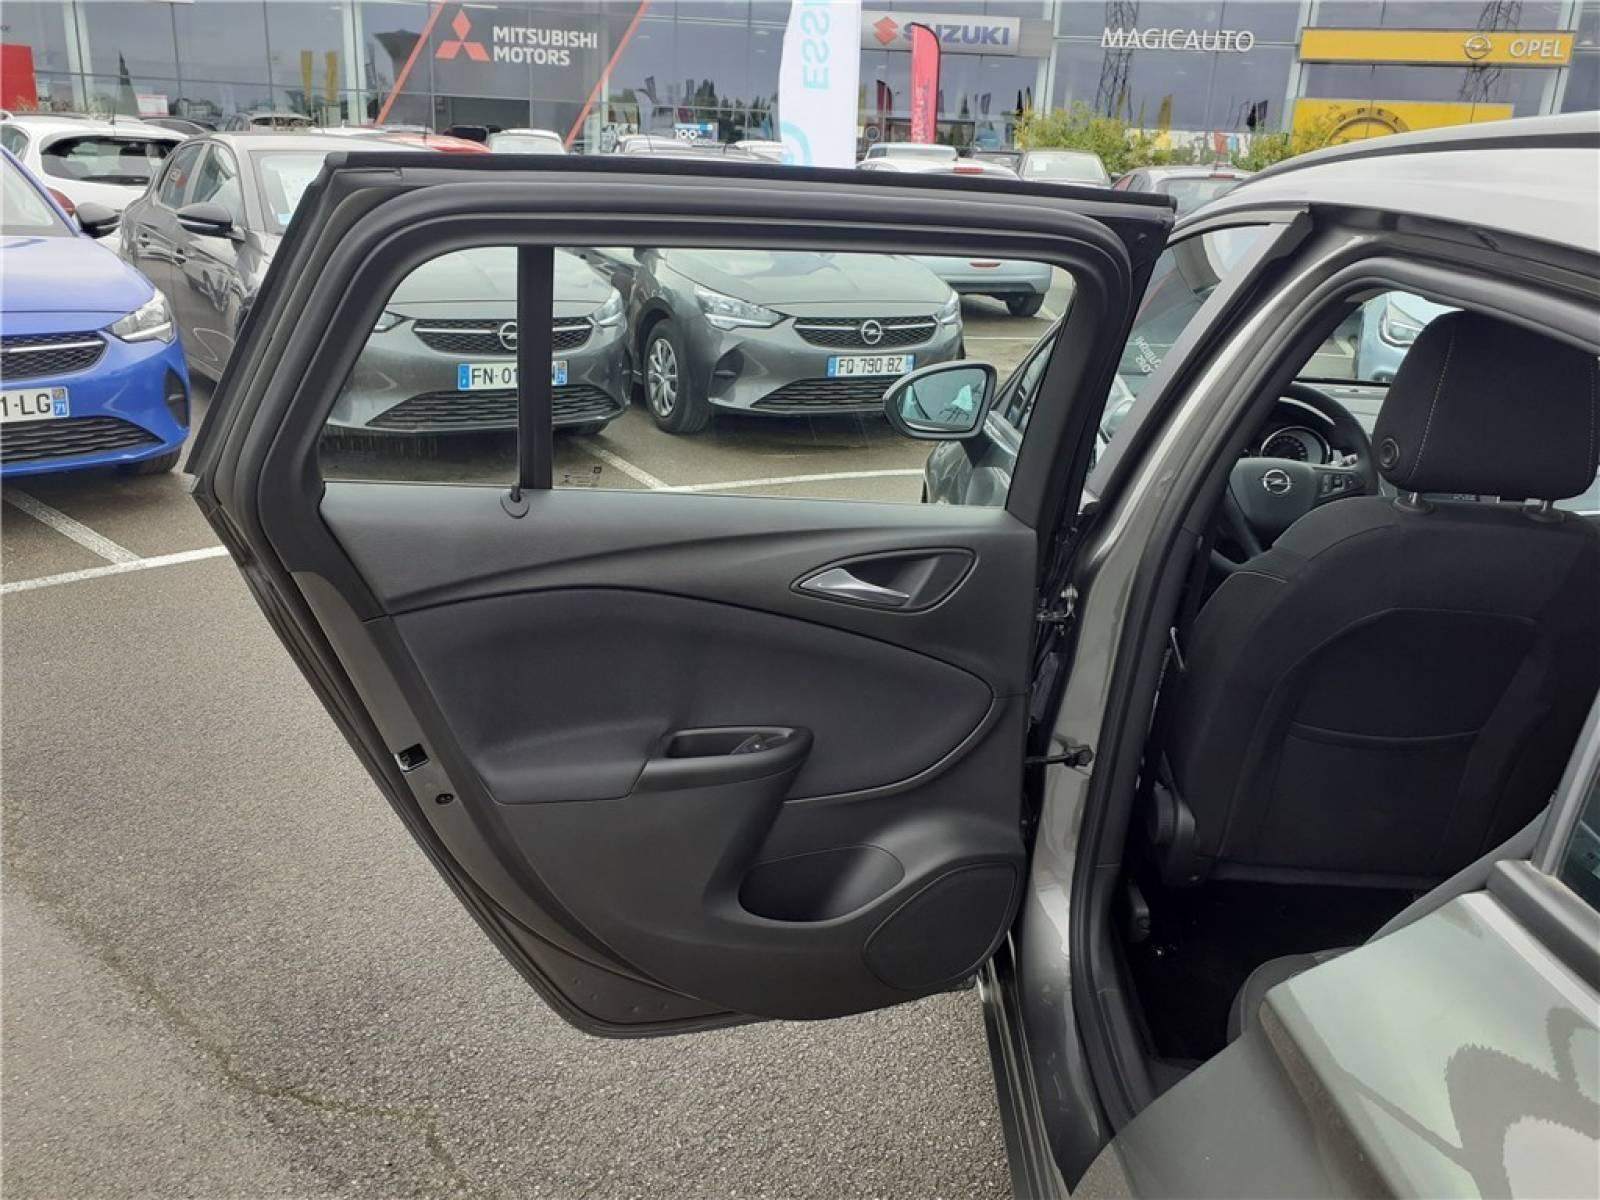 OPEL Astra Sports Tourer 1.5 Diesel 122 ch BVA9 - véhicule d'occasion - Groupe Guillet - Opel Magicauto - Chalon-sur-Saône - 71380 - Saint-Marcel - 27